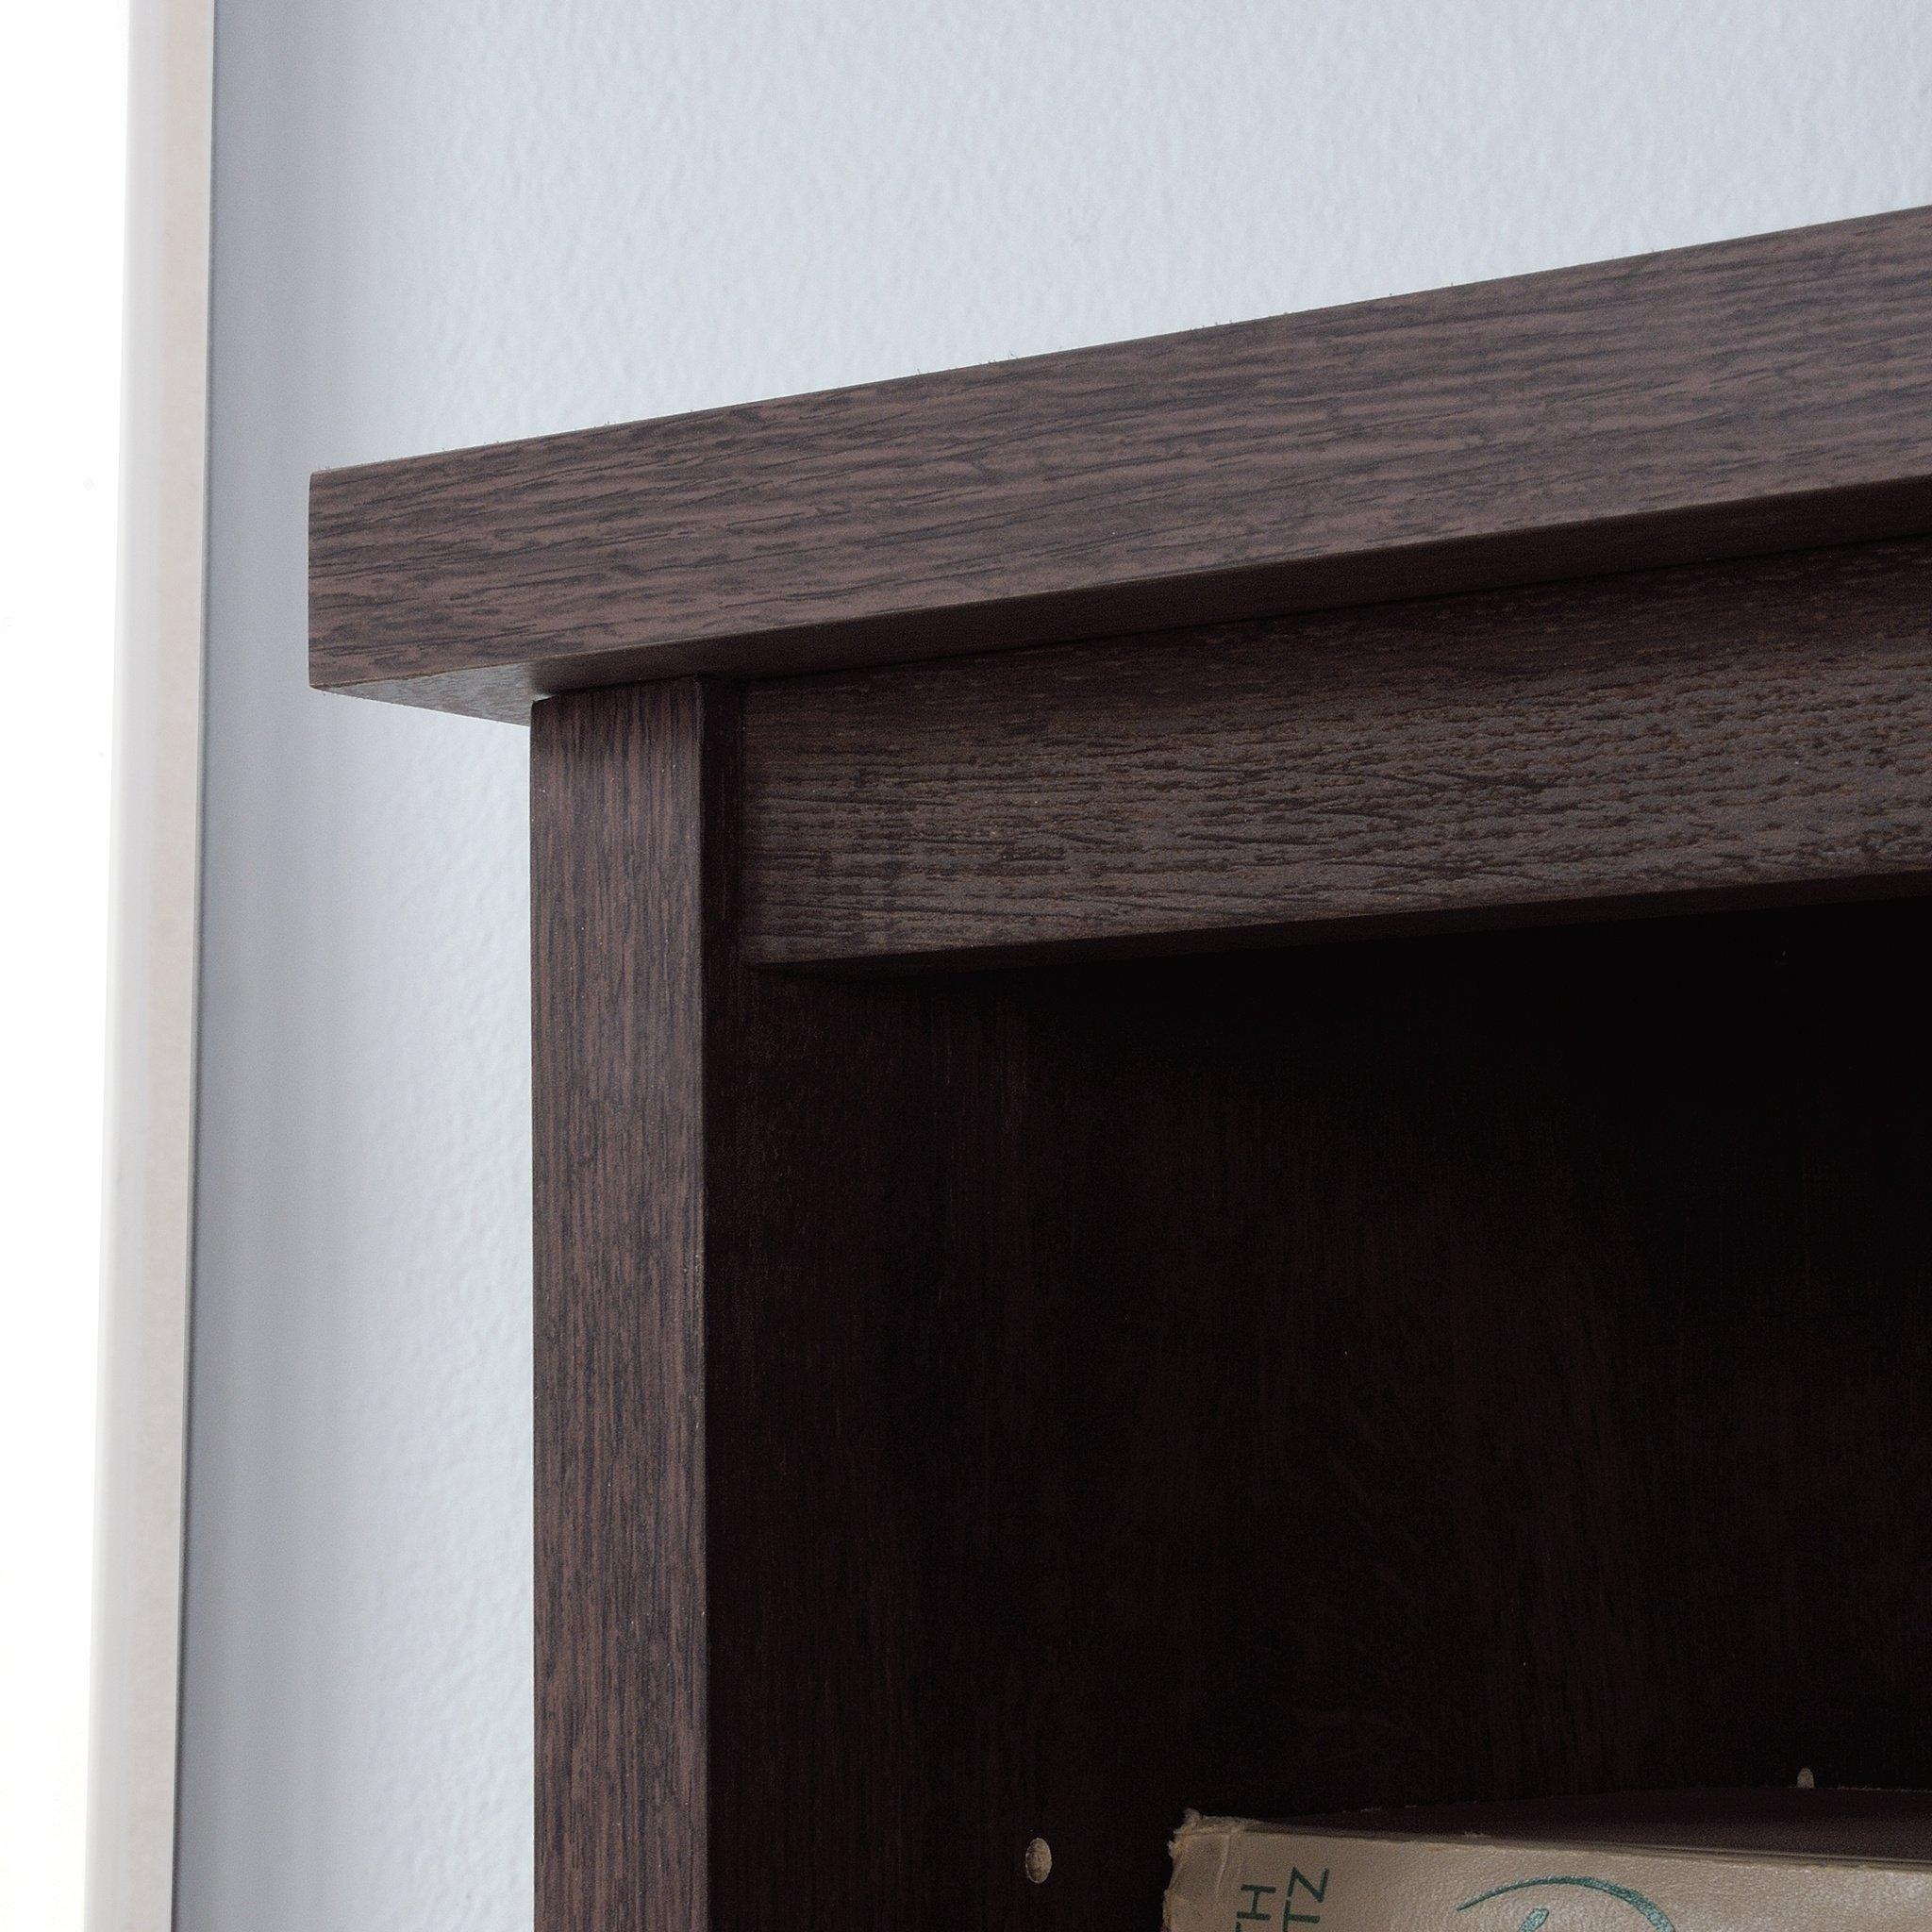 Sauder 422983 Costa Large Hutch, L: 64.57'' x W: 13.19'' x H: 40.04'', Coffee Oak Finish by Sauder (Image #4)